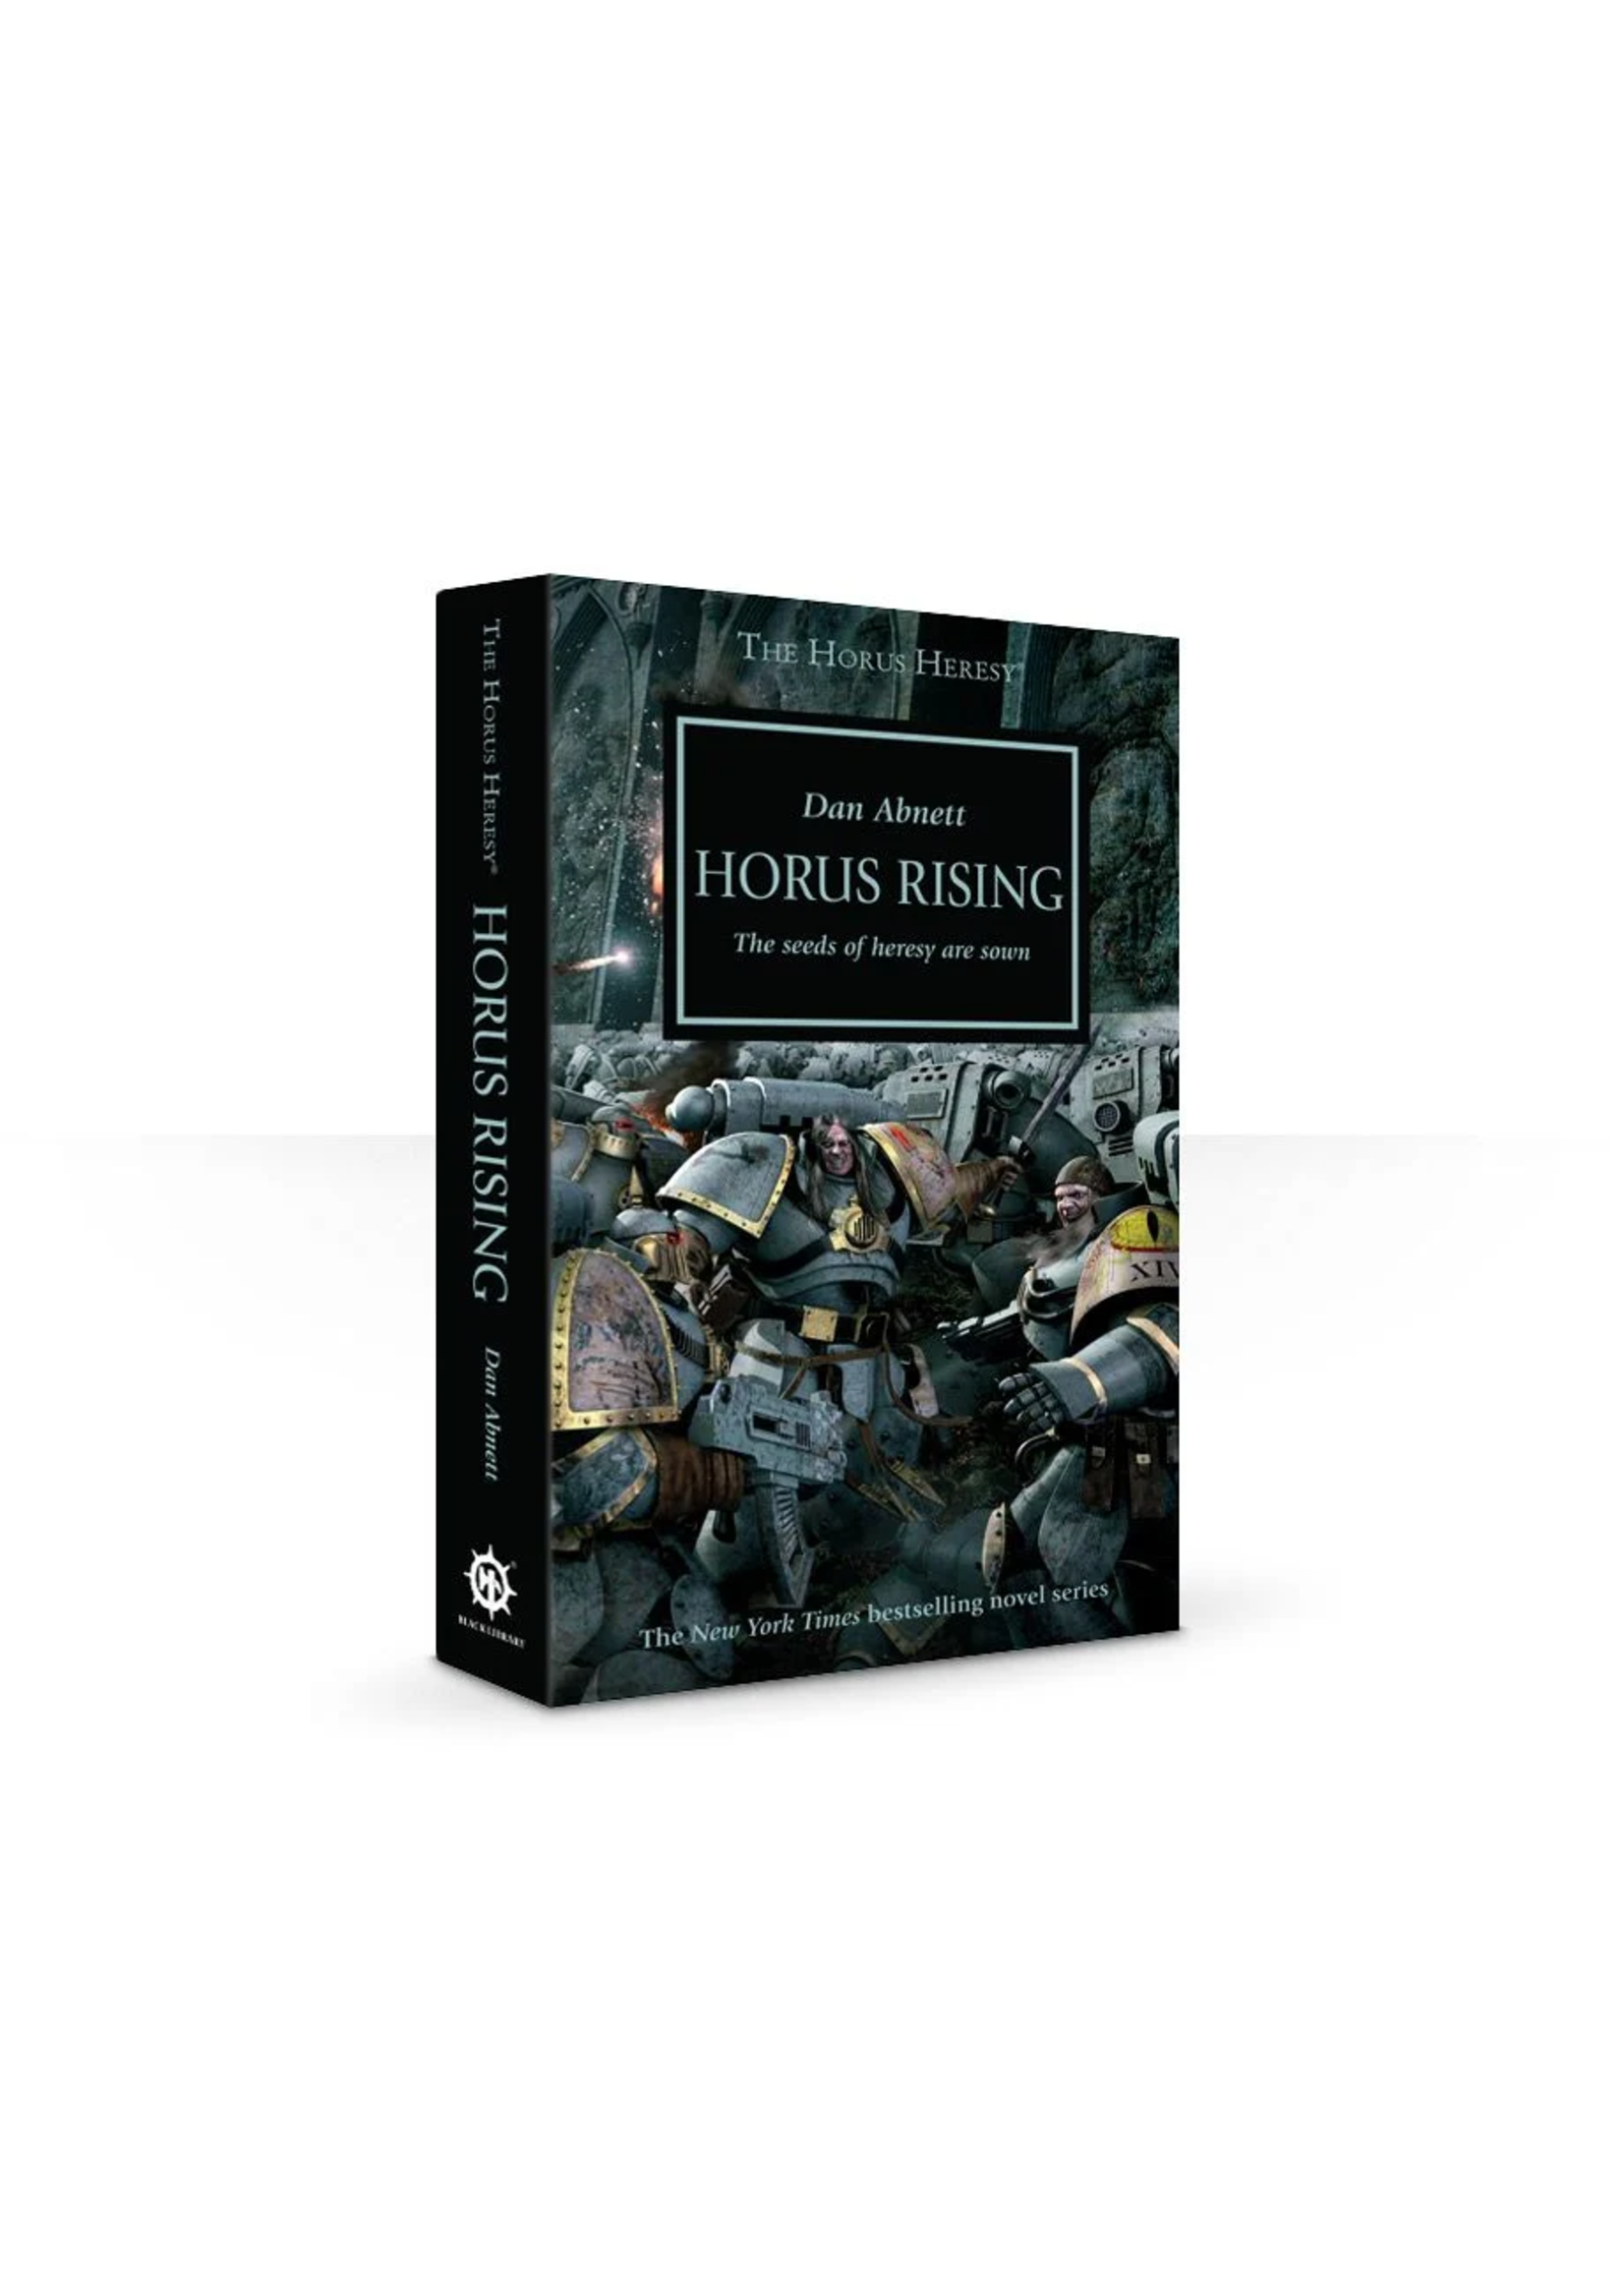 Horus Heresy: Horus Rising (Bl1126)